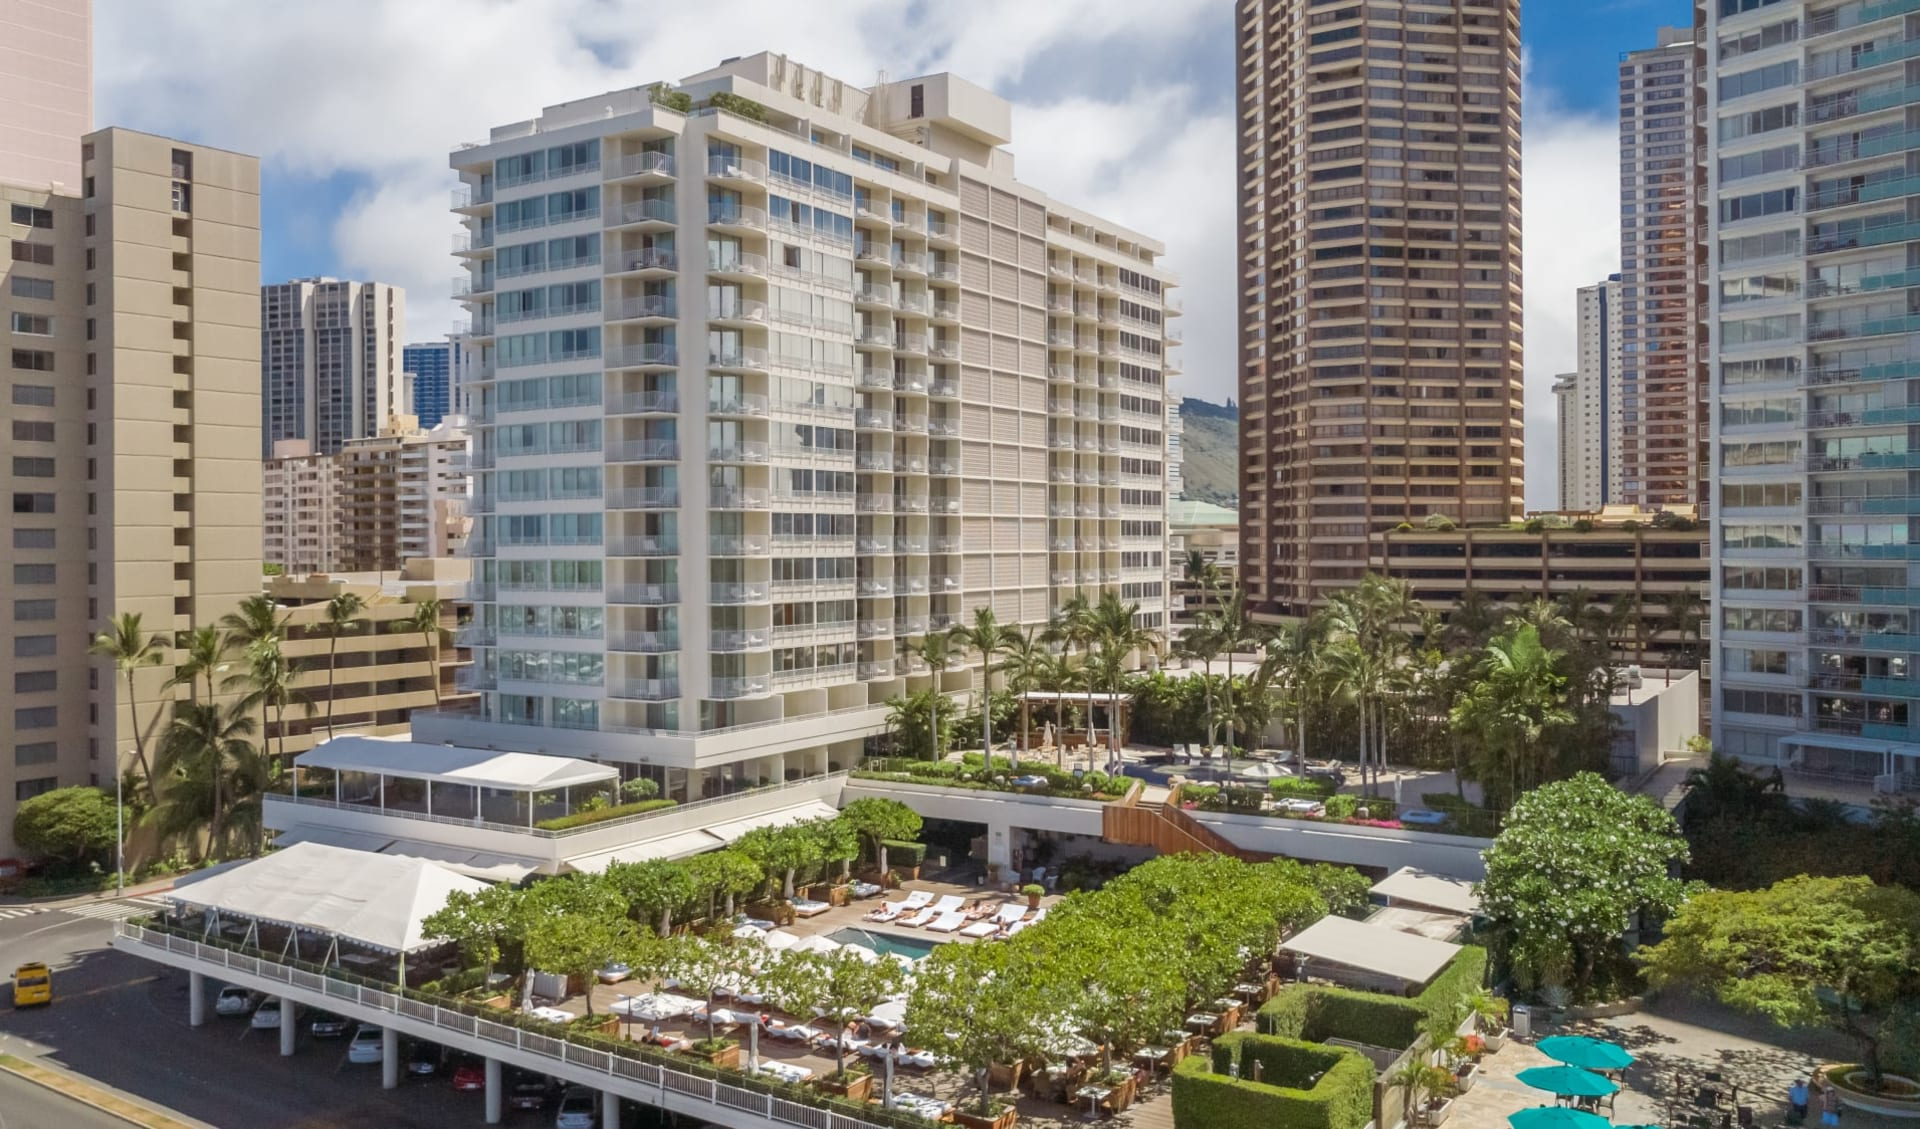 The Modern Honolulu in Honolulu - Oahu:  The Modern Honolulu_Aussenansicht